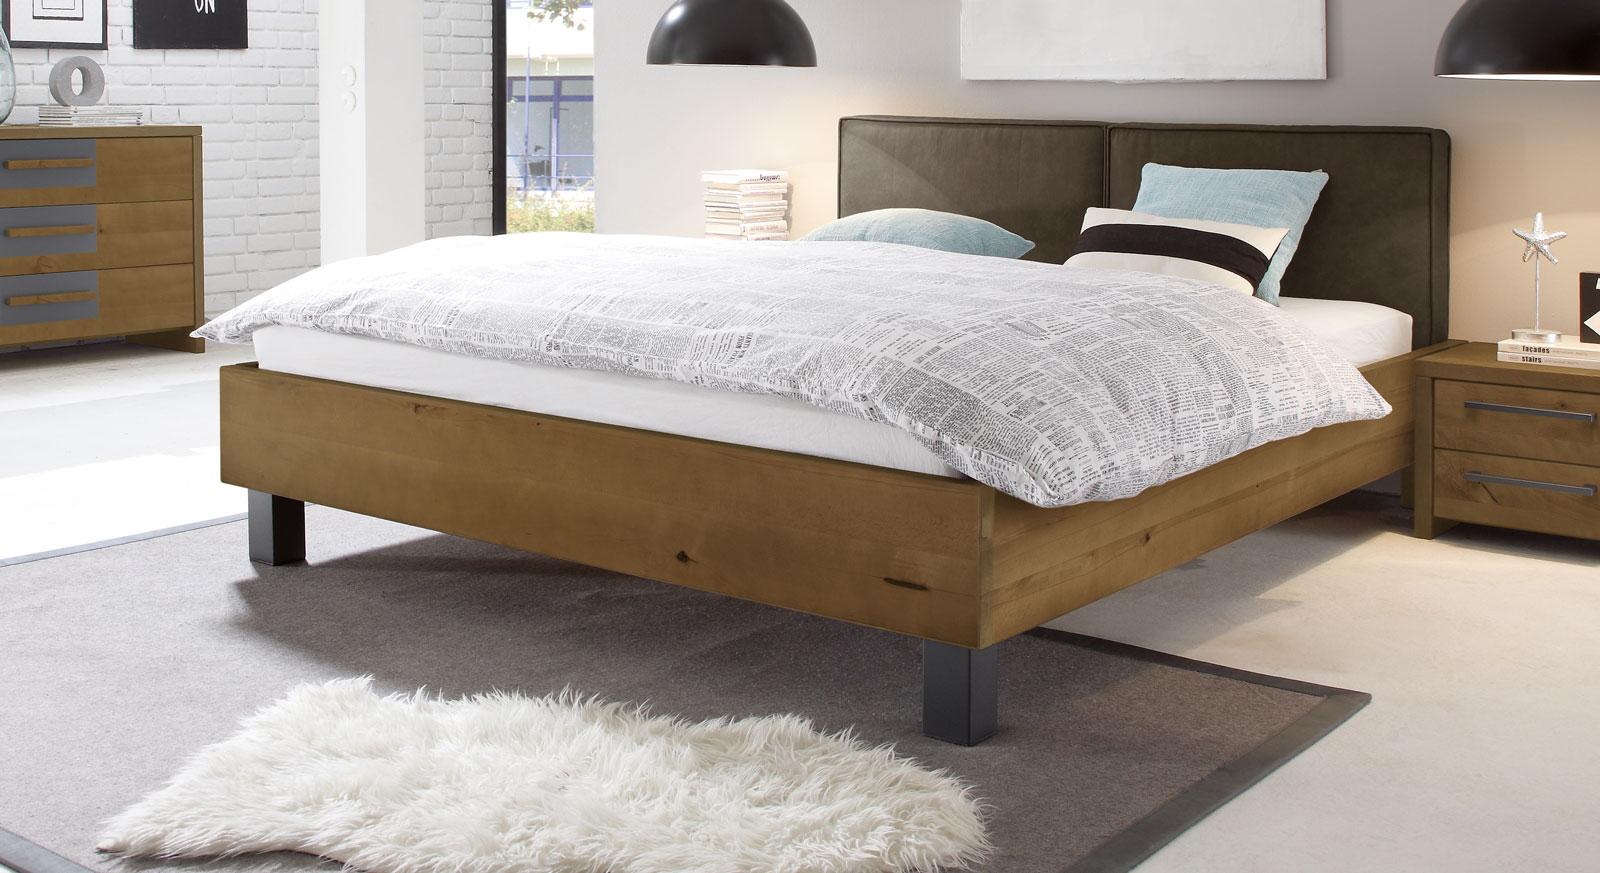 bett in vollholz buche in z b 140x200 cm tonala. Black Bedroom Furniture Sets. Home Design Ideas